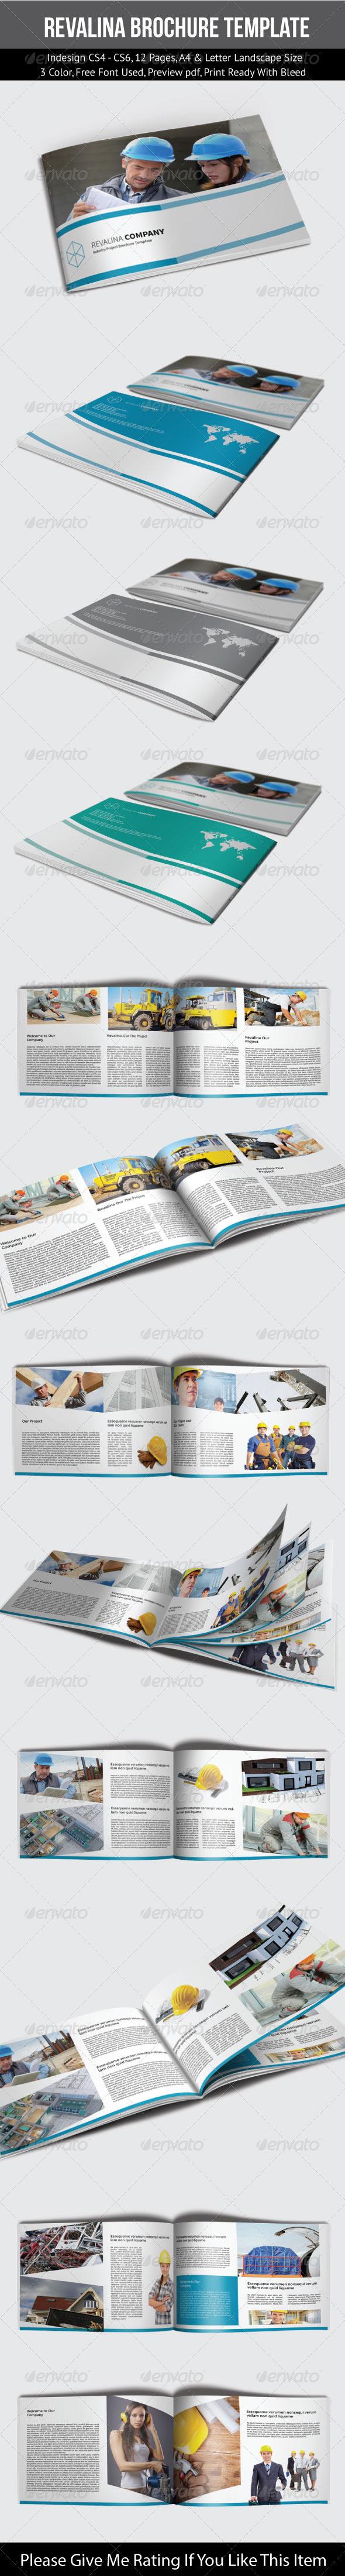 GraphicRiver Revalina Corporate Brochure Template 7301059